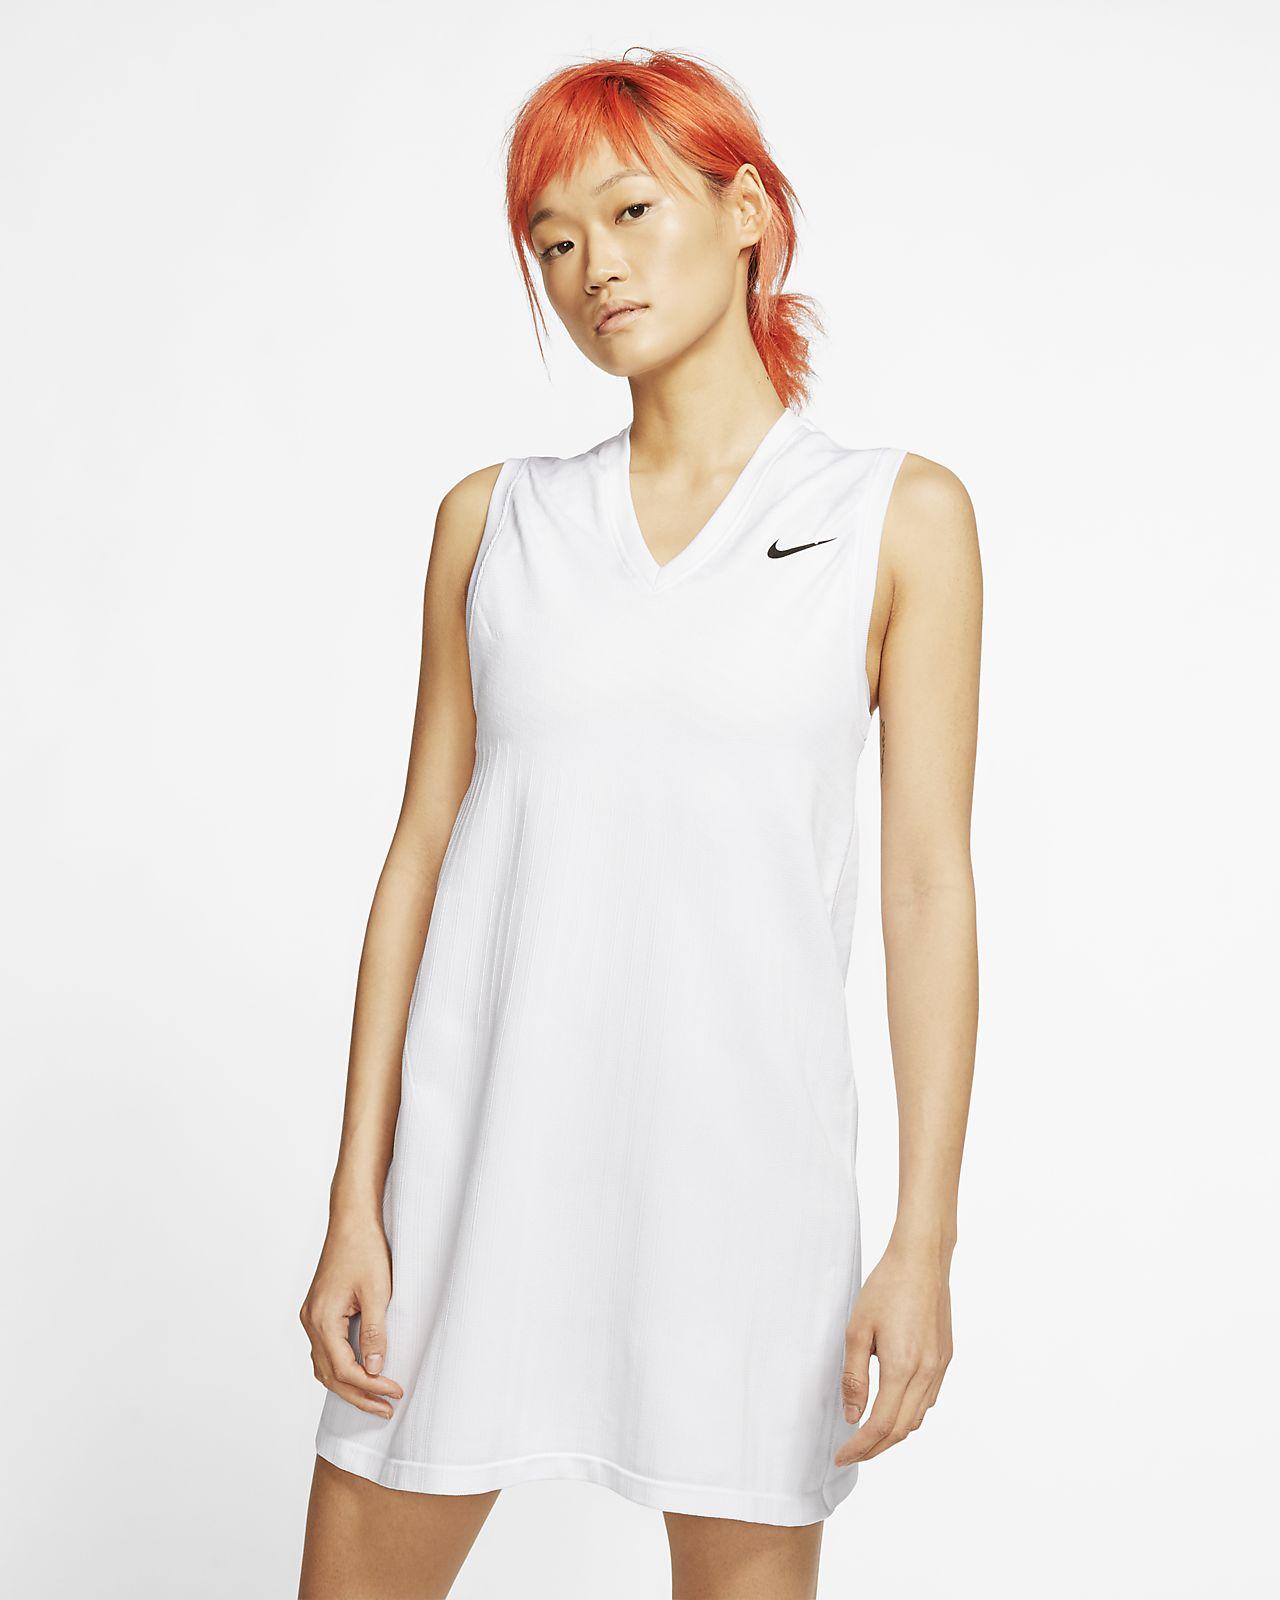 Maria Kadın Tenis Elbisesi